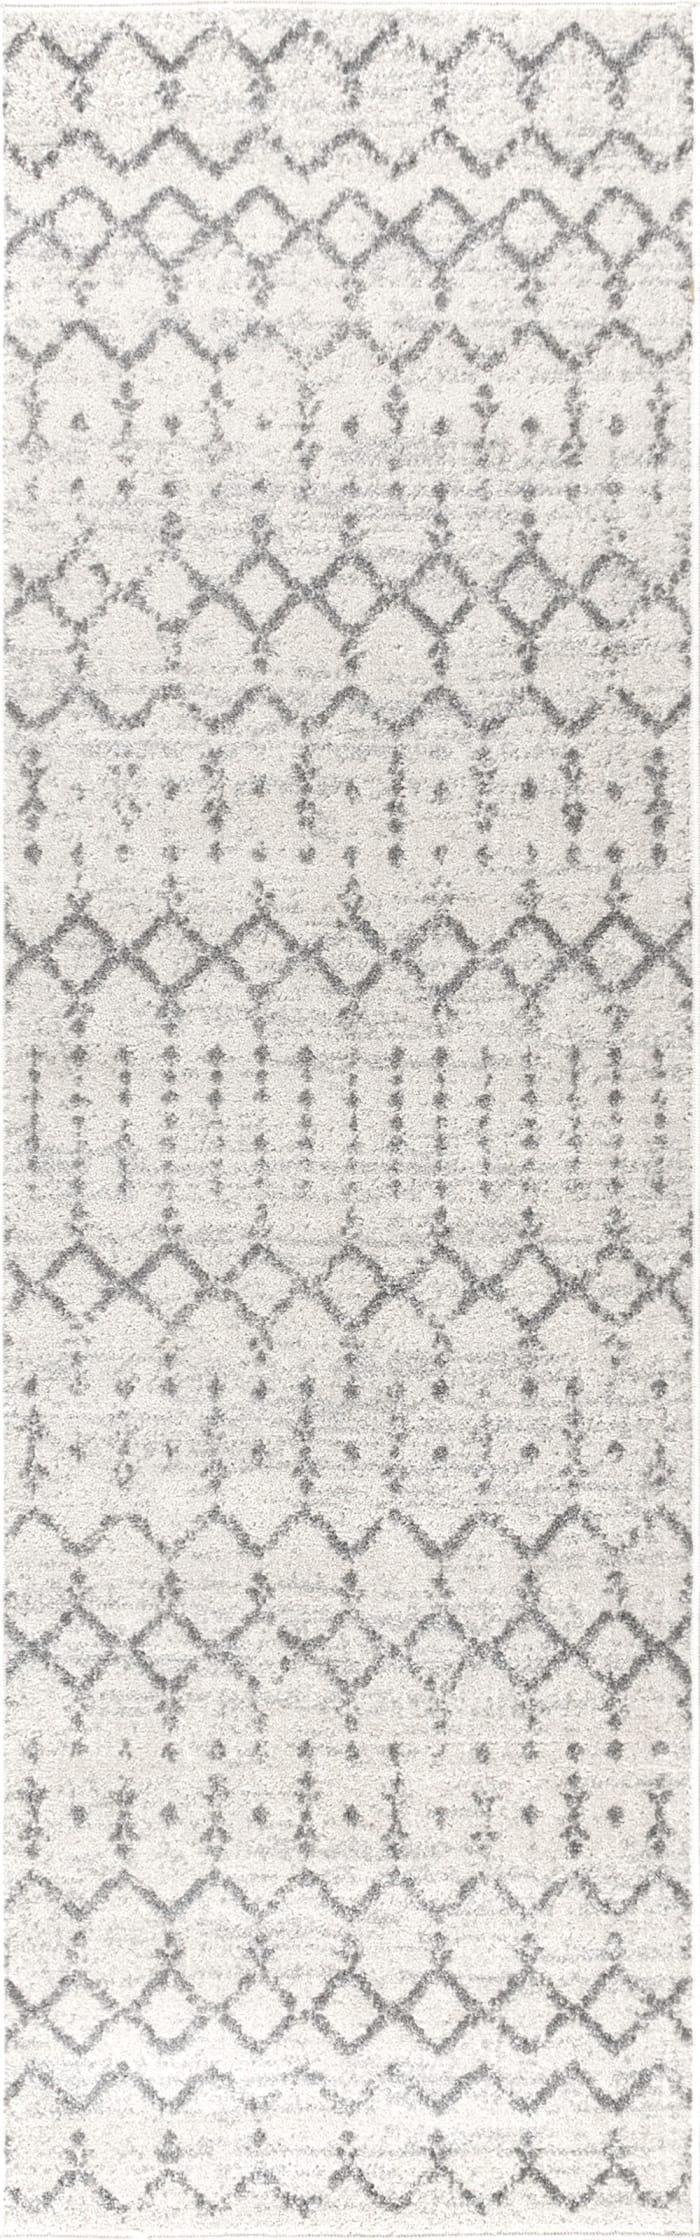 Moroccan HYPE Boho Vintage Diamond Cream/Gray 2.25' x 8' Runner Rug